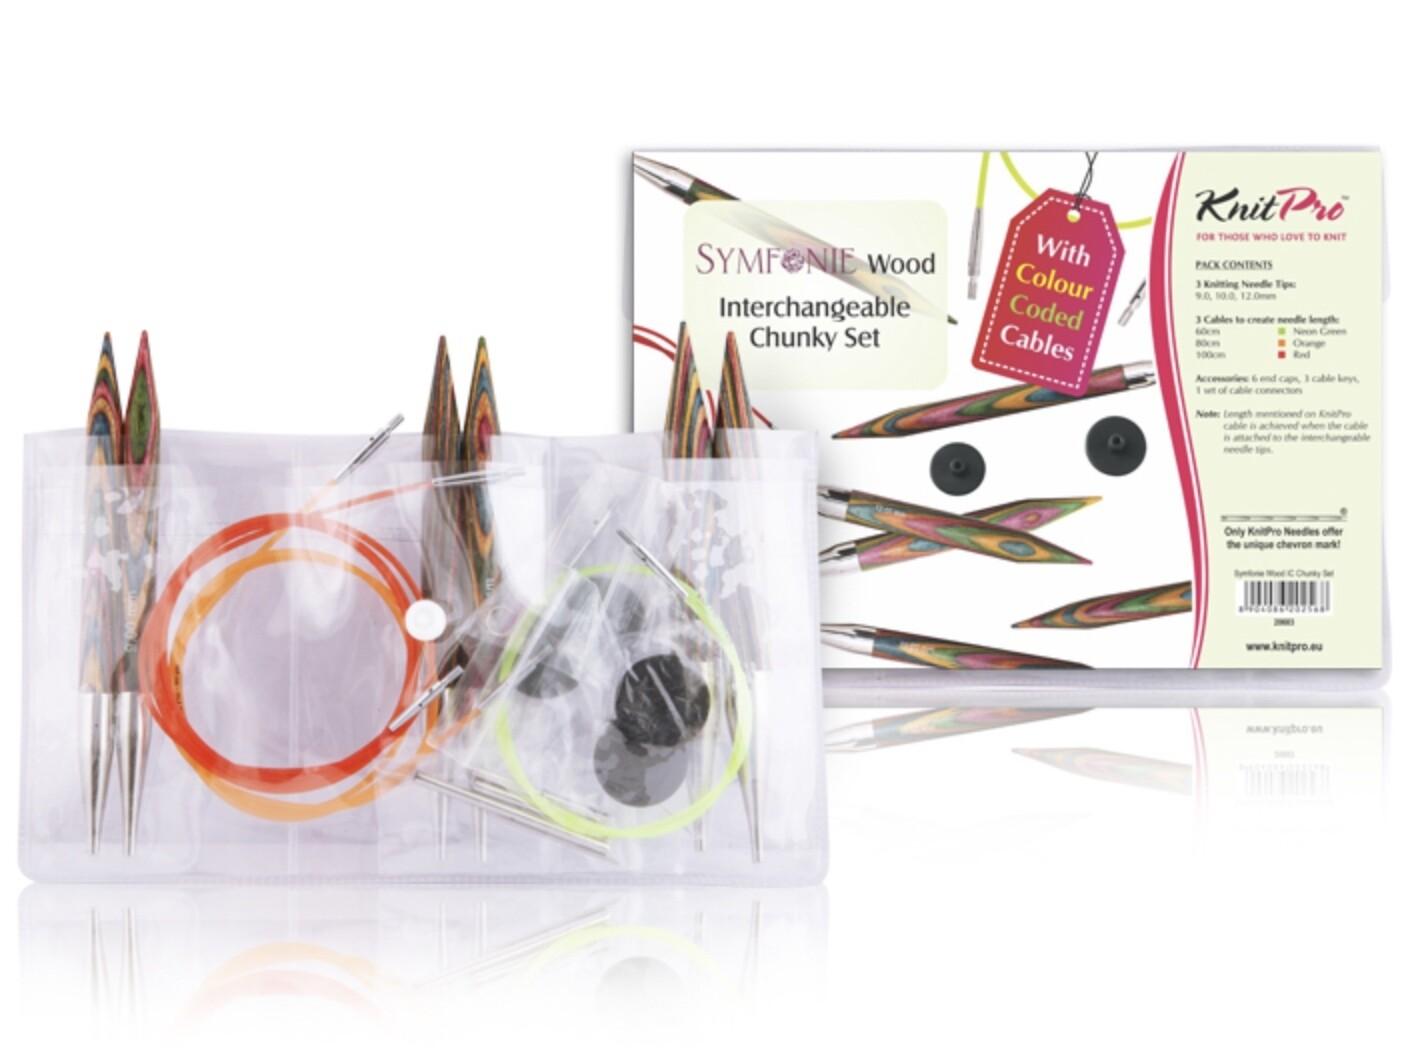 KnitPro Symfonie Chunky kit - interchangeable circulars